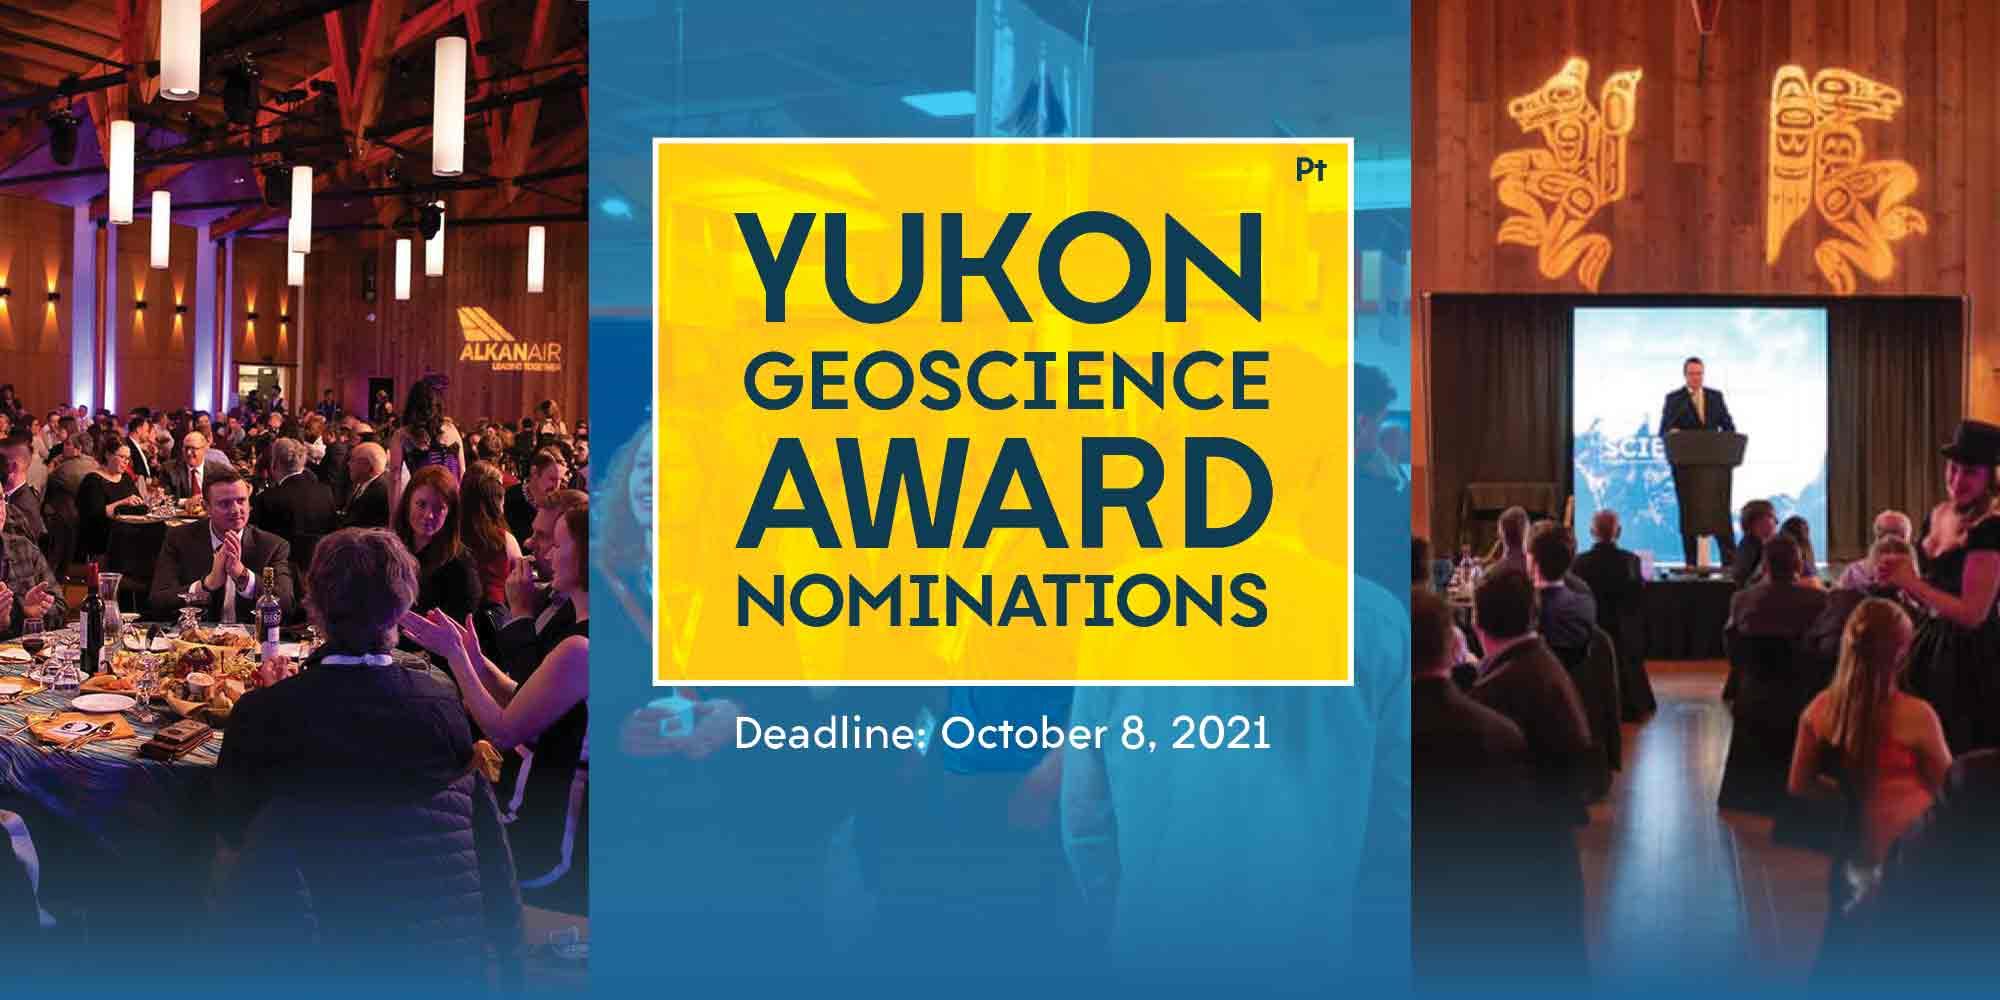 Geoscience2021-AwardsNomination-2000x1000